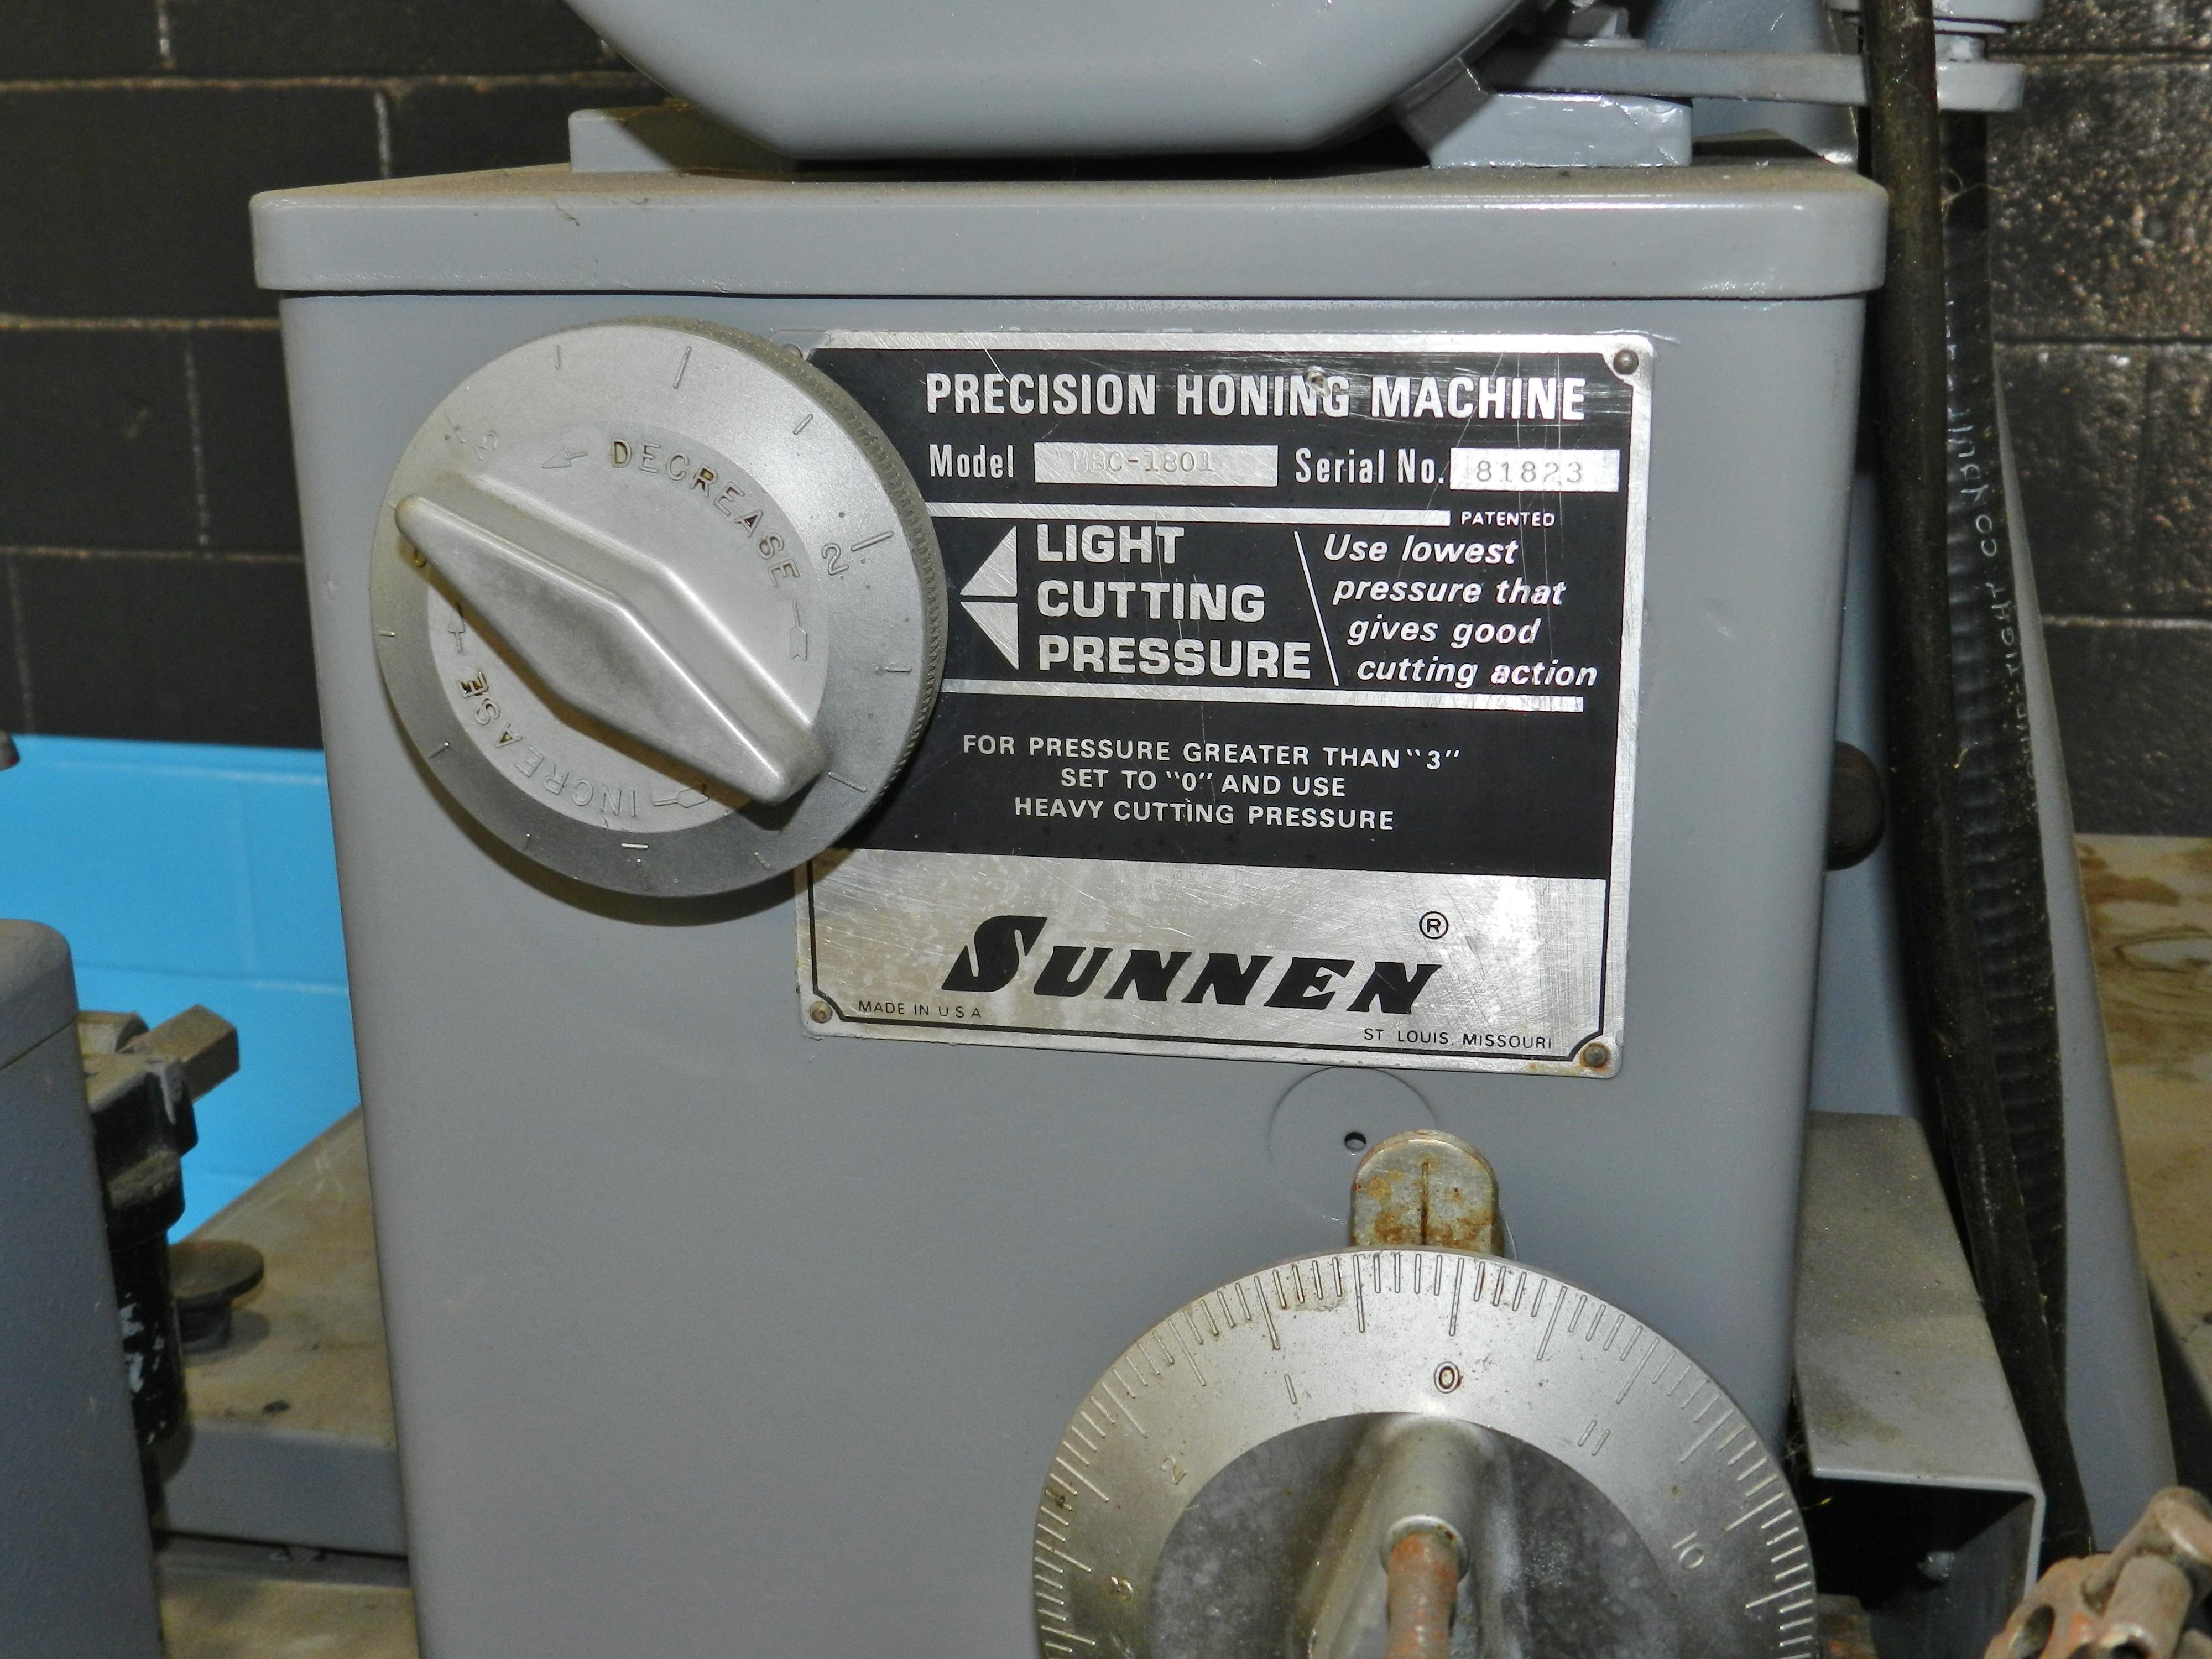 Lot 50 - Sunnen MBC-1801 Honing Machine